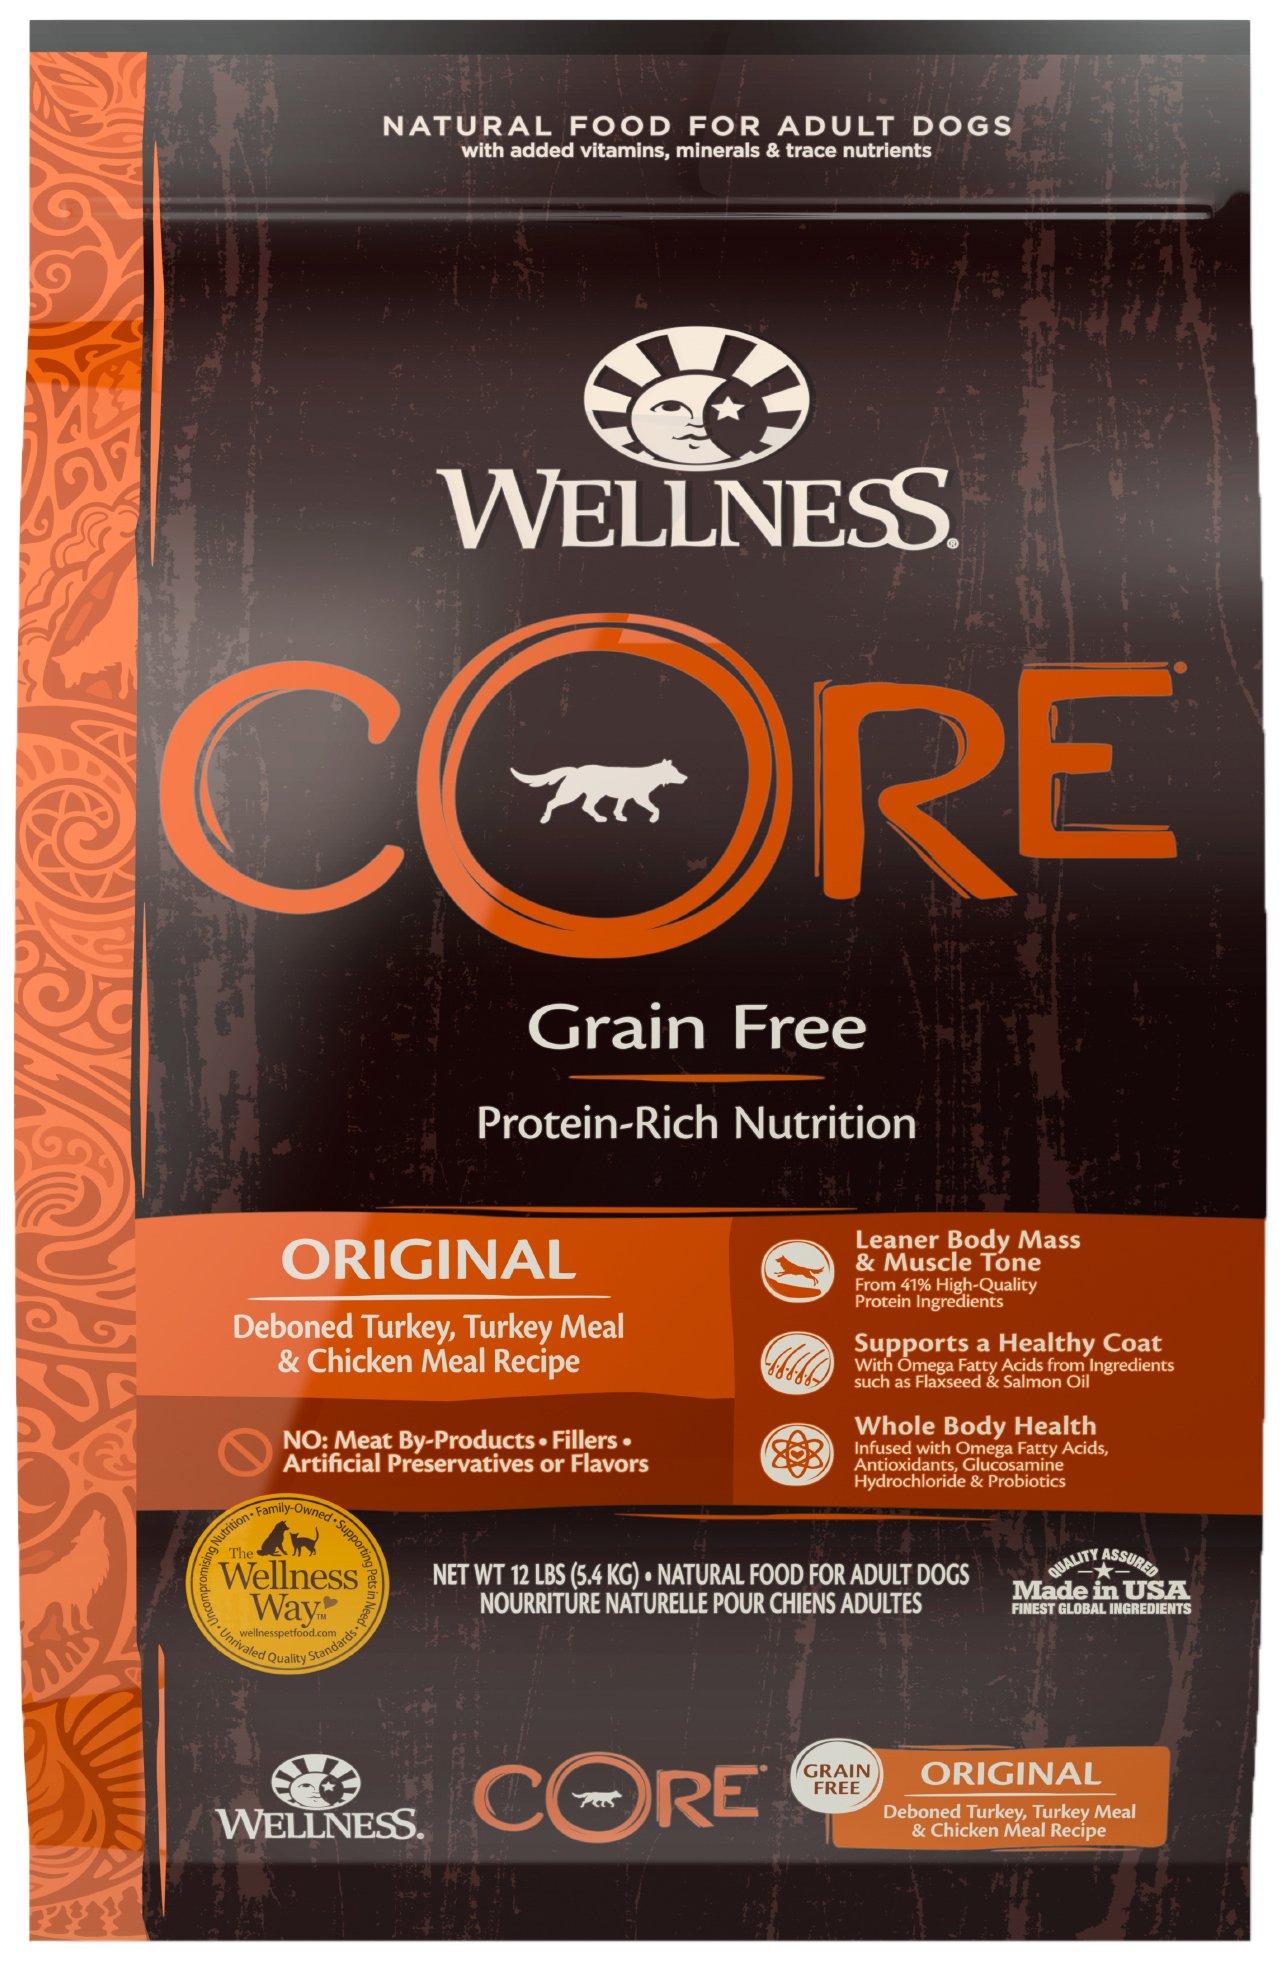 Amazon Pure Liver Support Milk Thistle Dandelion Root